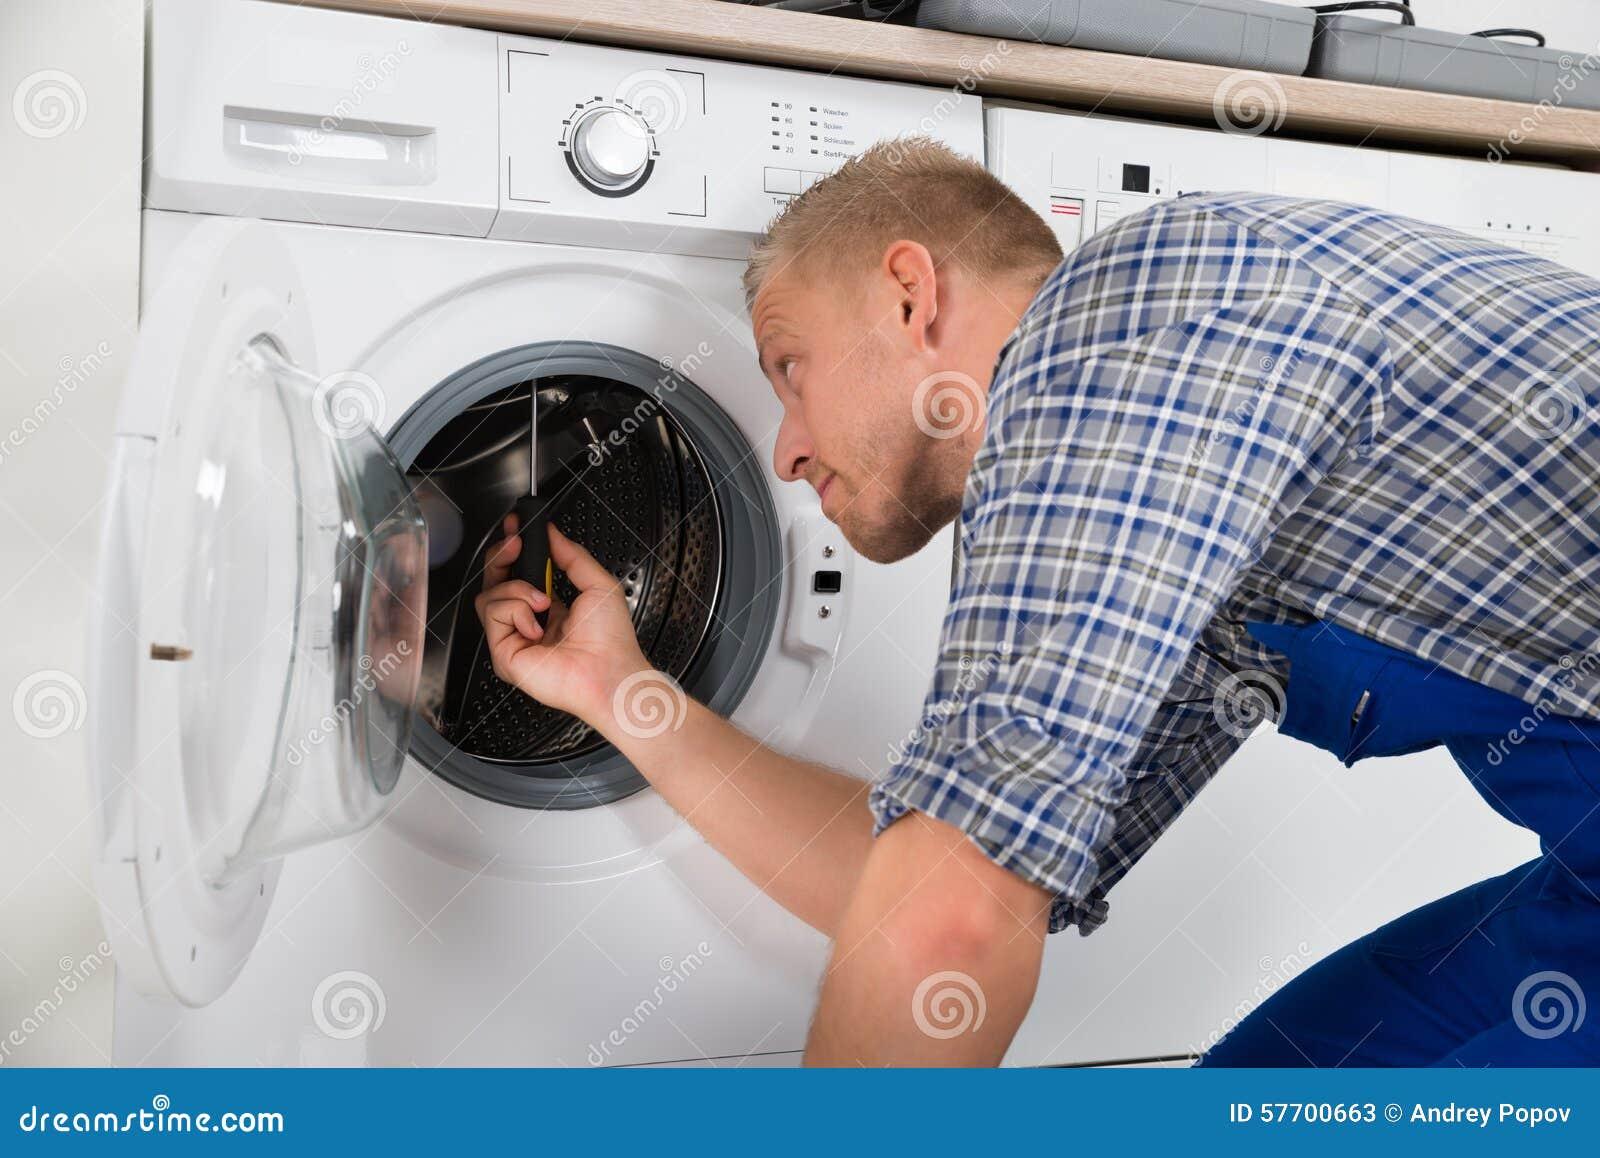 Hersteller Repairing Washer